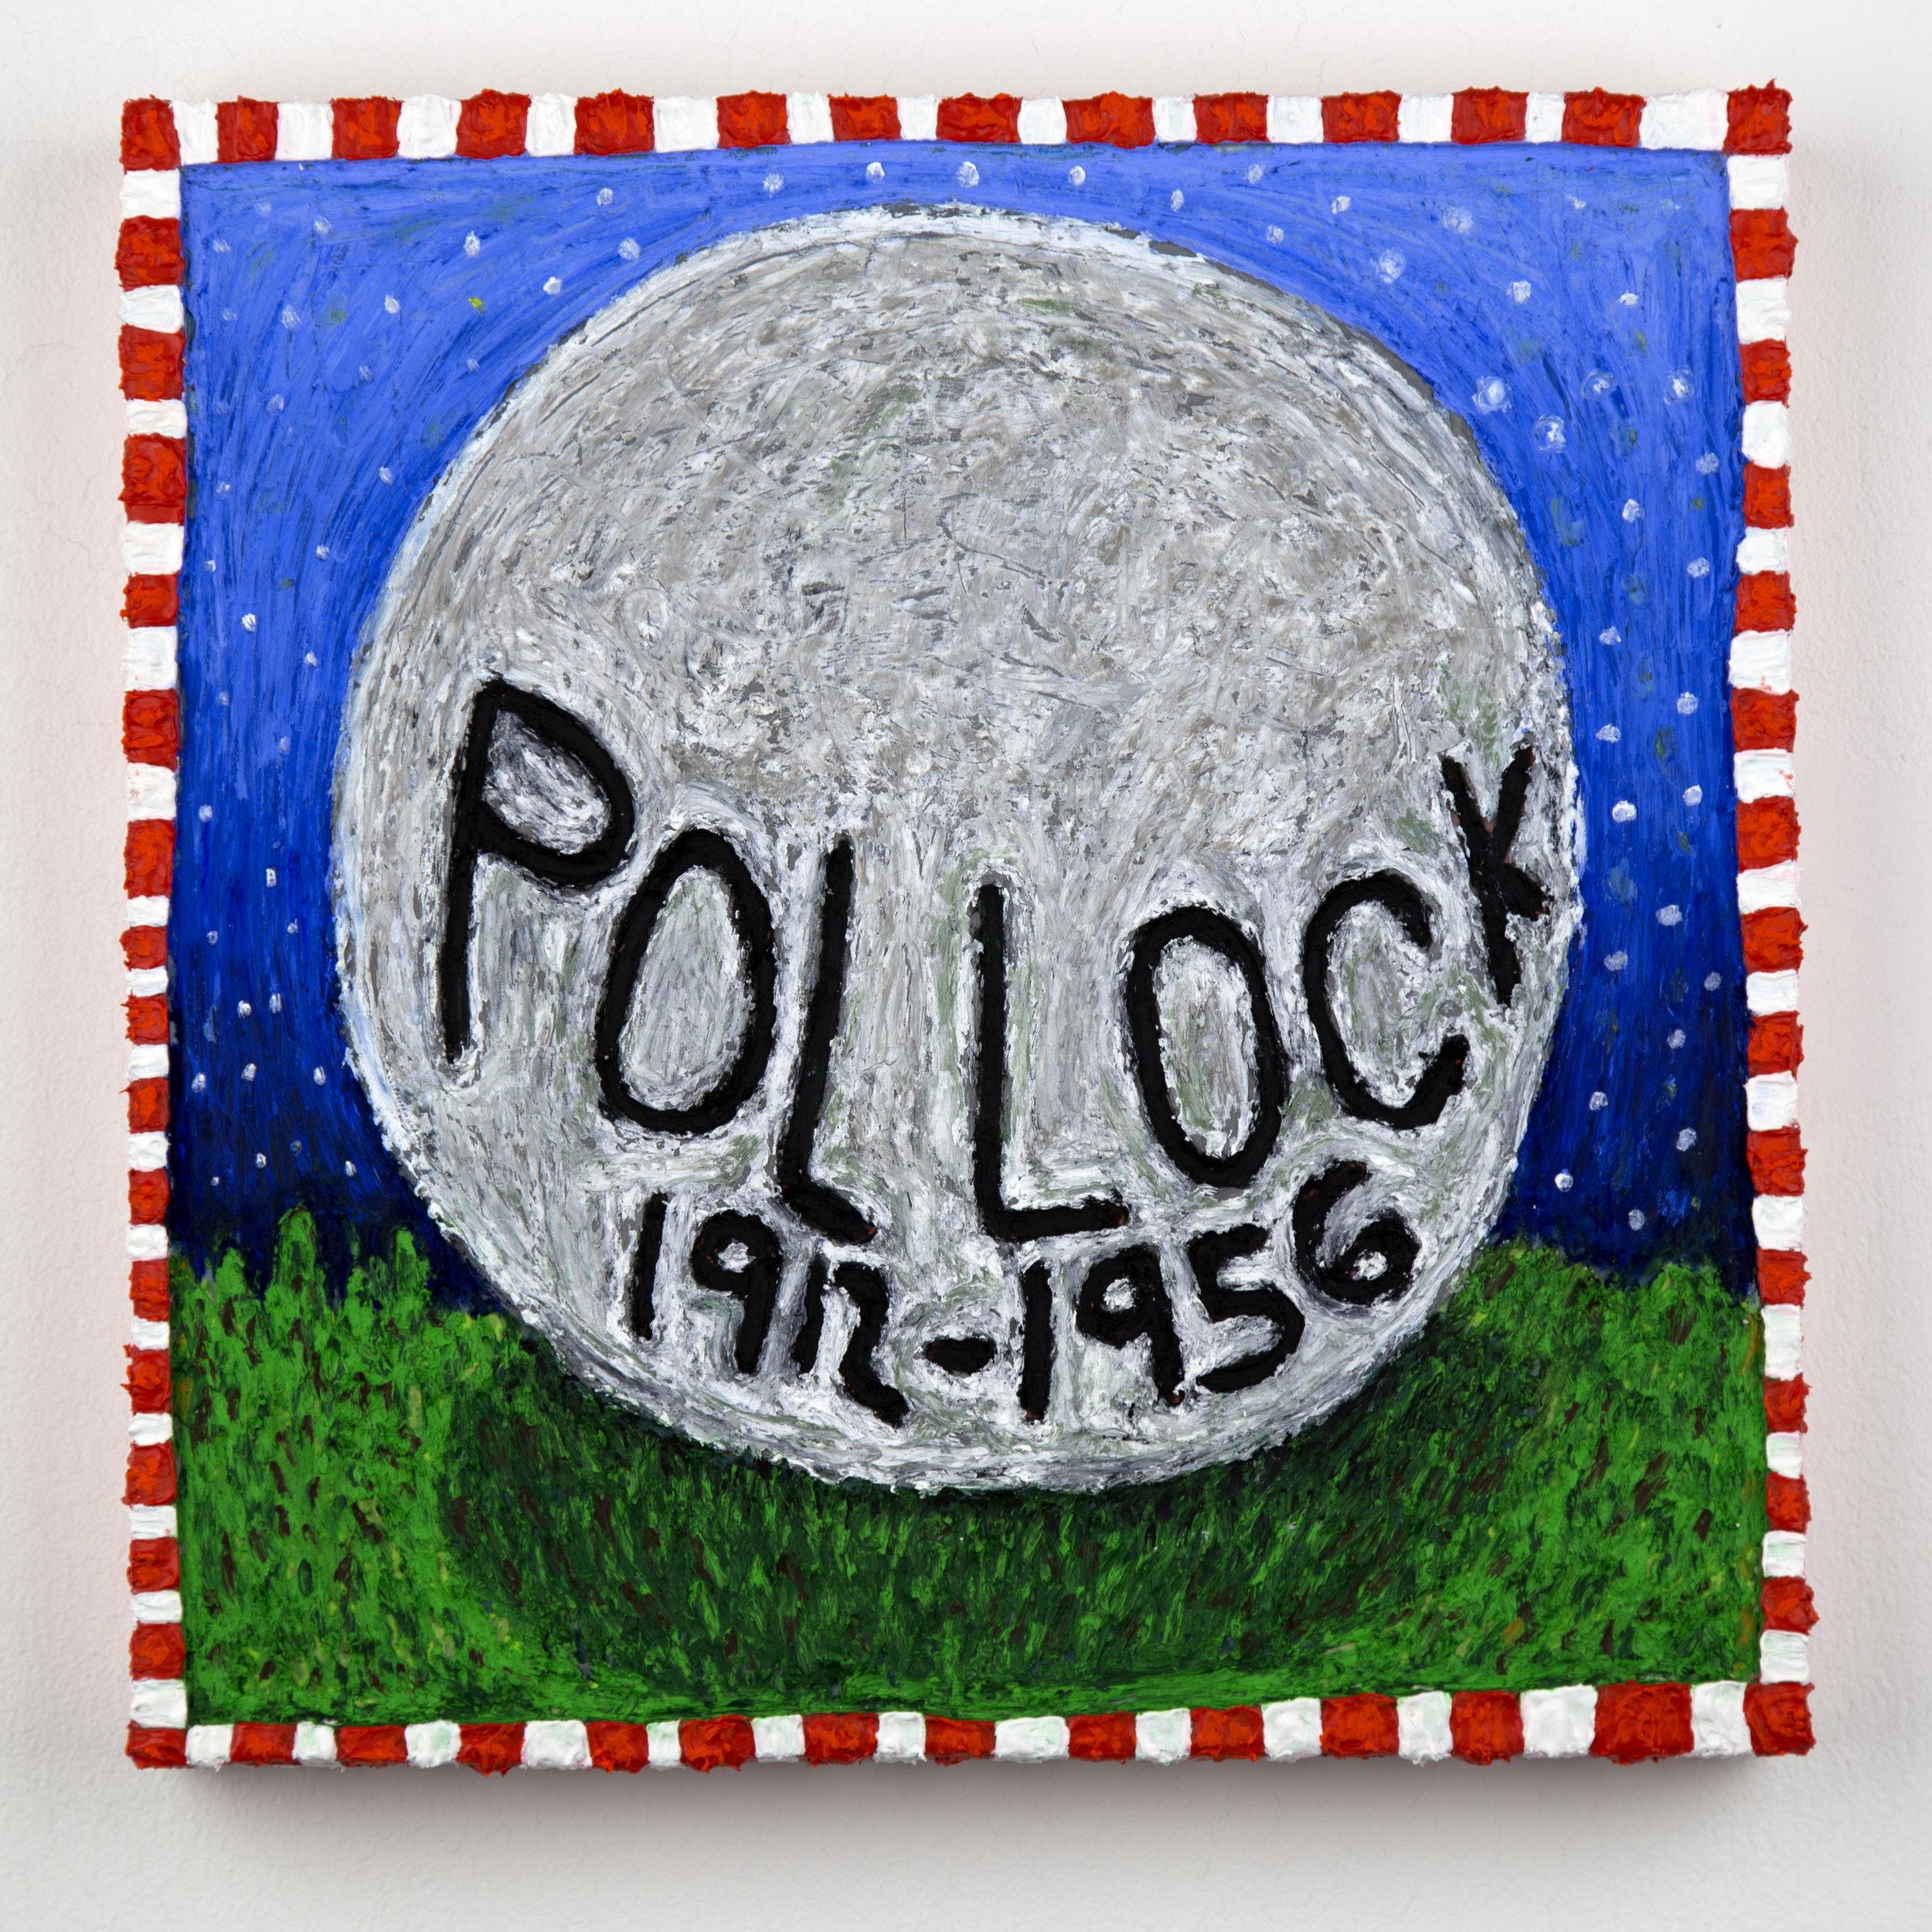 Jackson Pollock's Tombstone Blues: 1912-1956